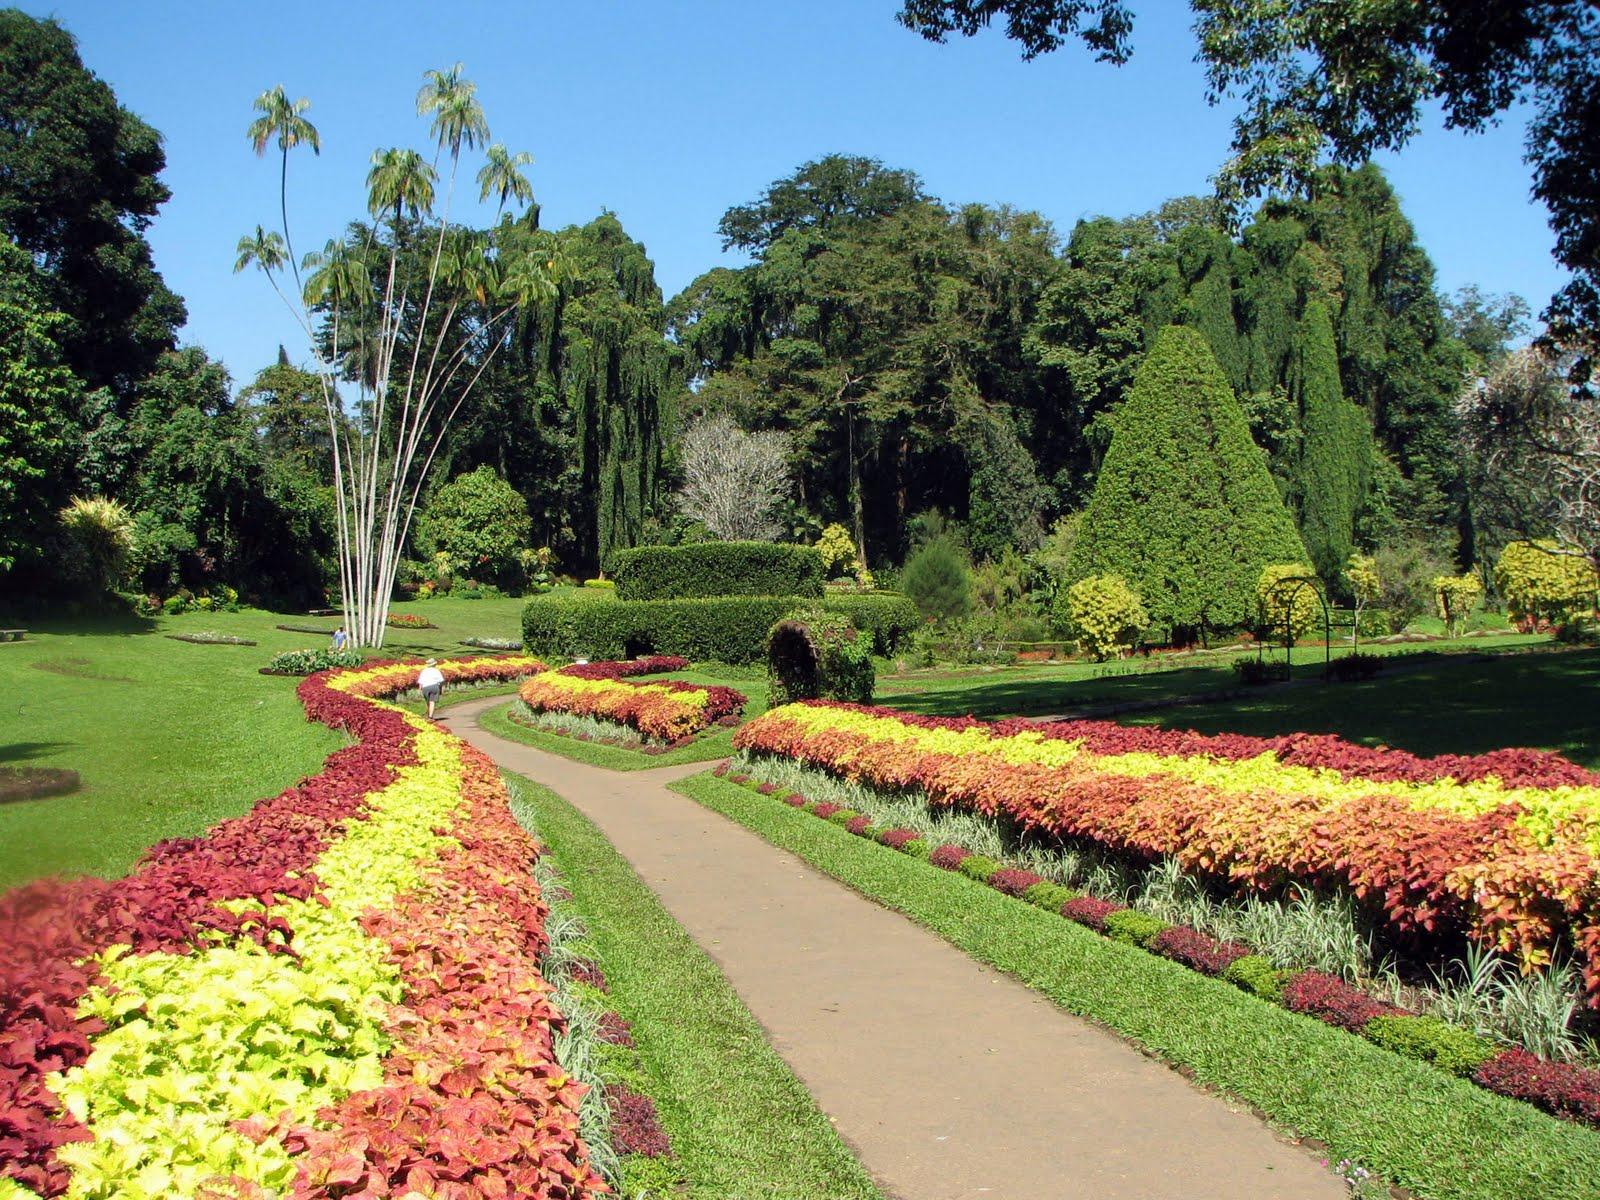 http://1.bp.blogspot.com/-stWHUpvBZUQ/T8yoOz0cp5I/AAAAAAAABlI/SisVxn2bojQ/s1600/botanical_garden_of_peradeniya_03.jpg